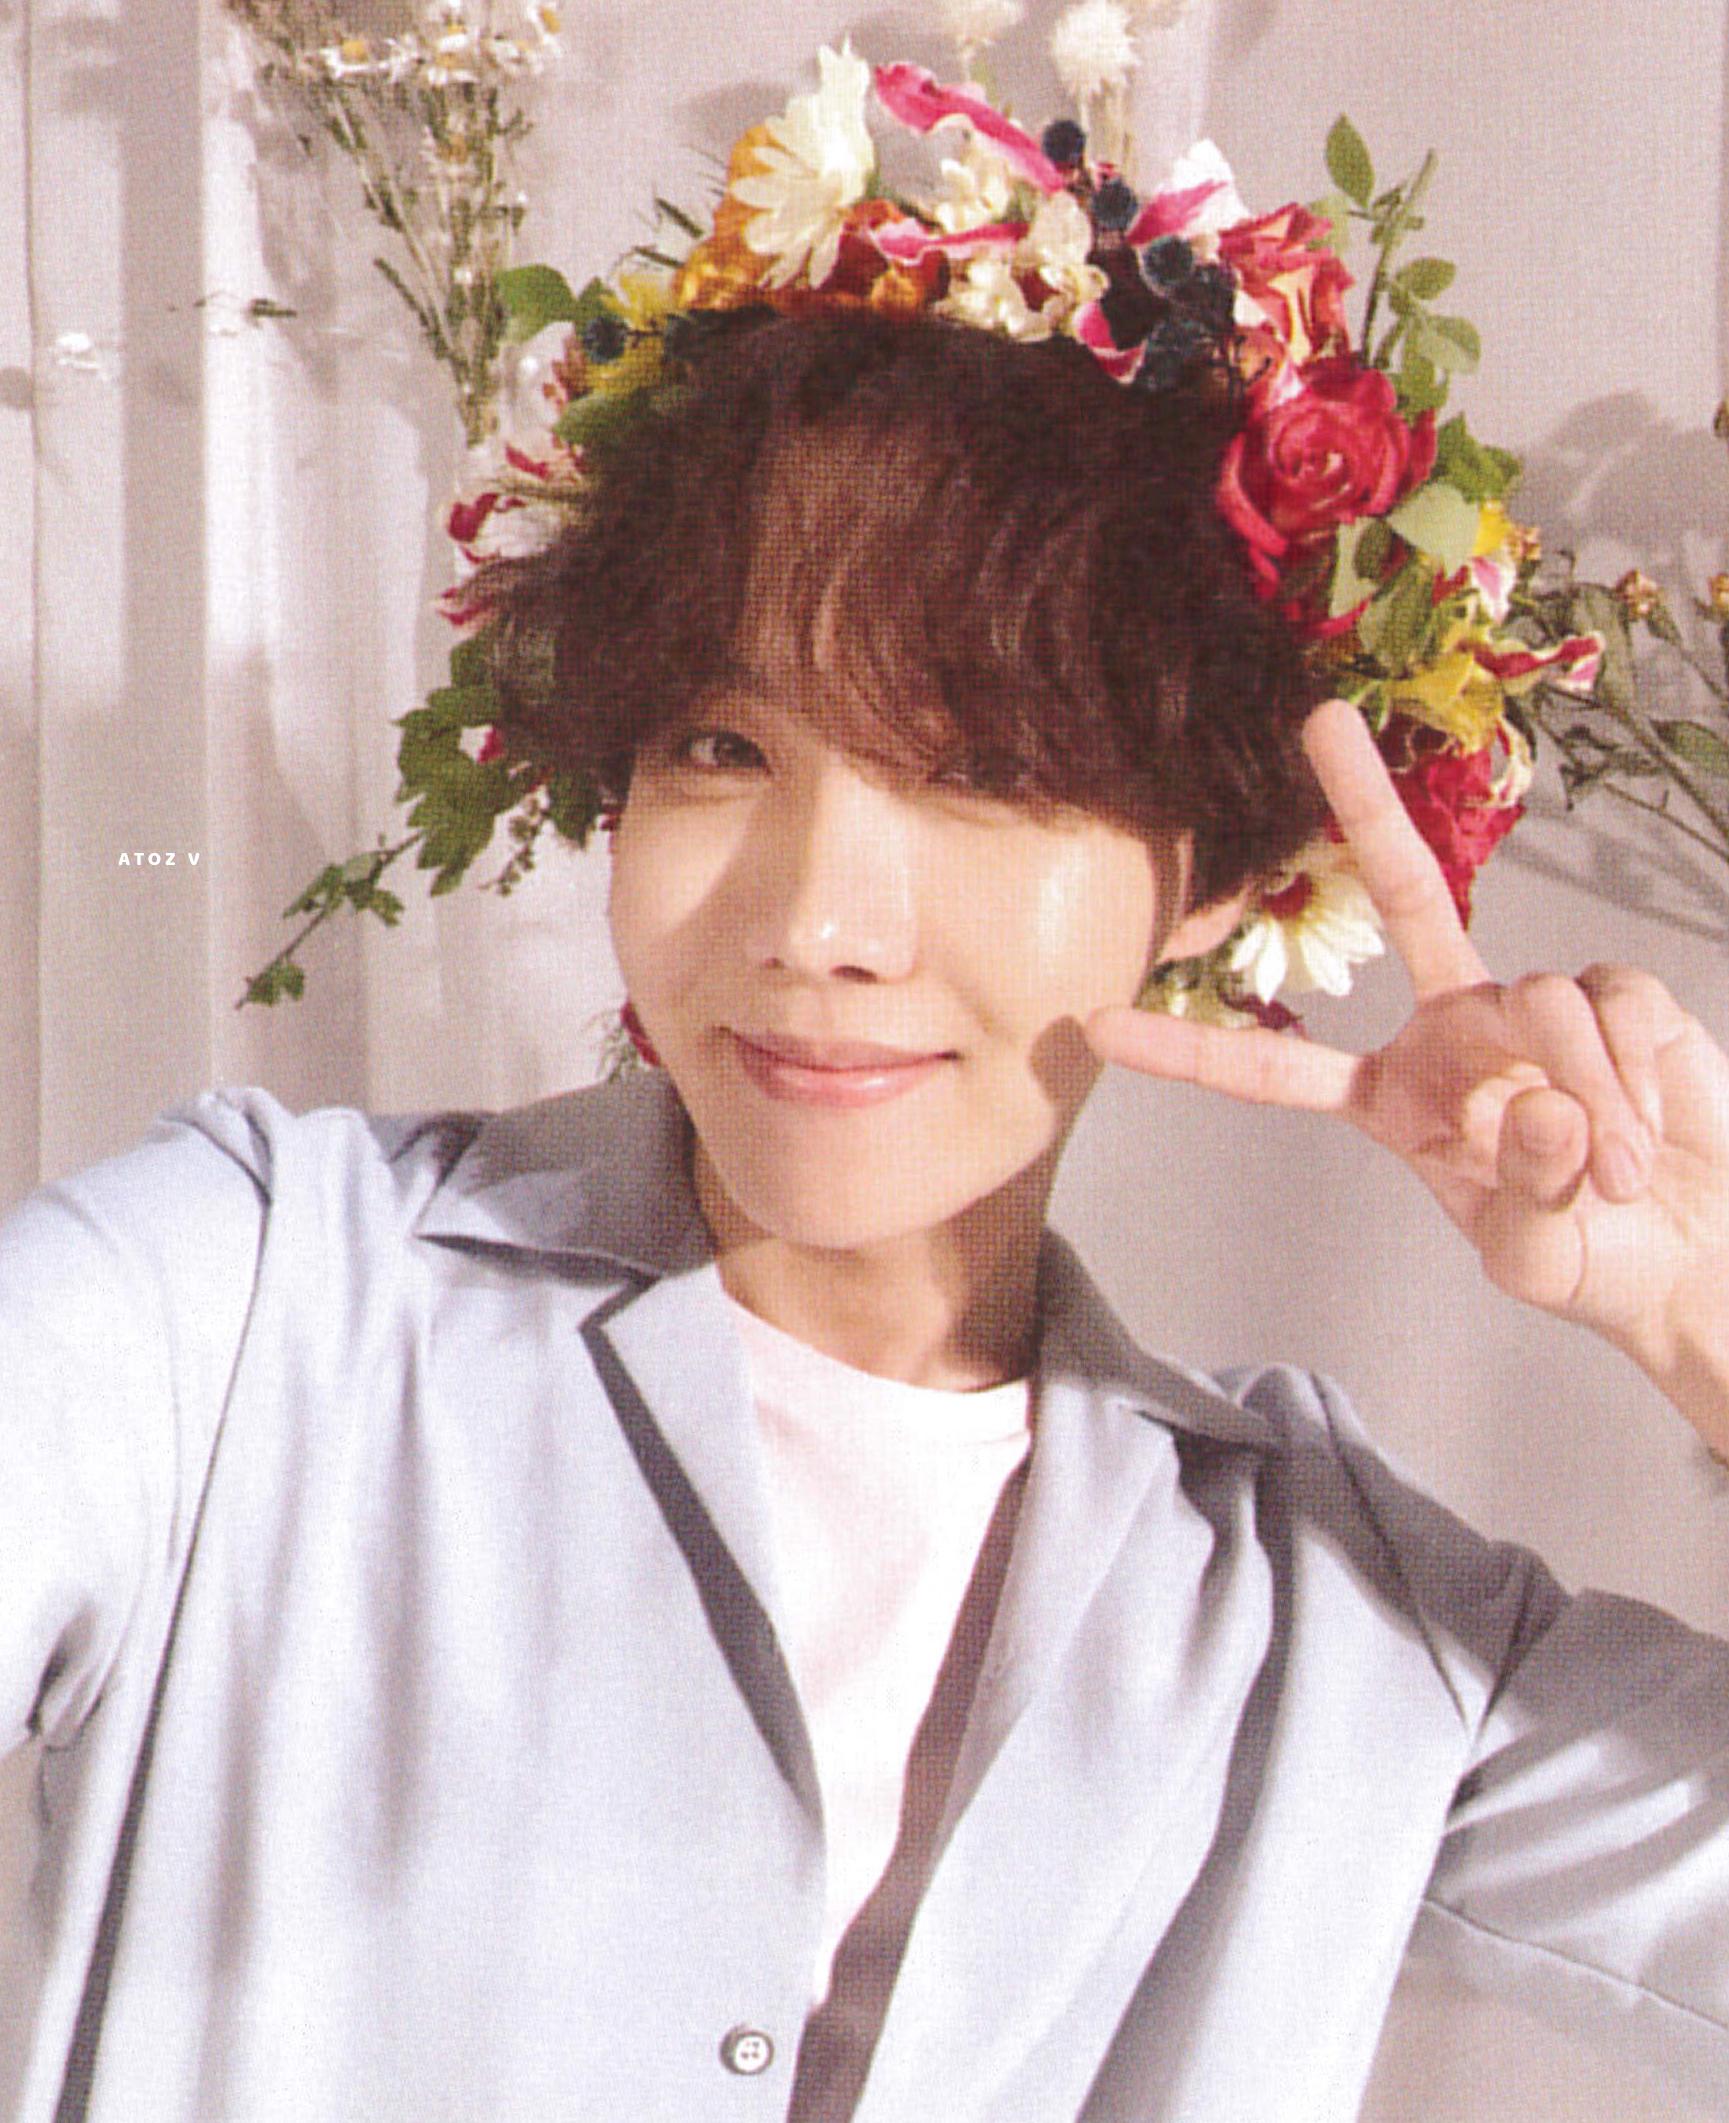 Flower Plant Asiachan Kpop Image Board